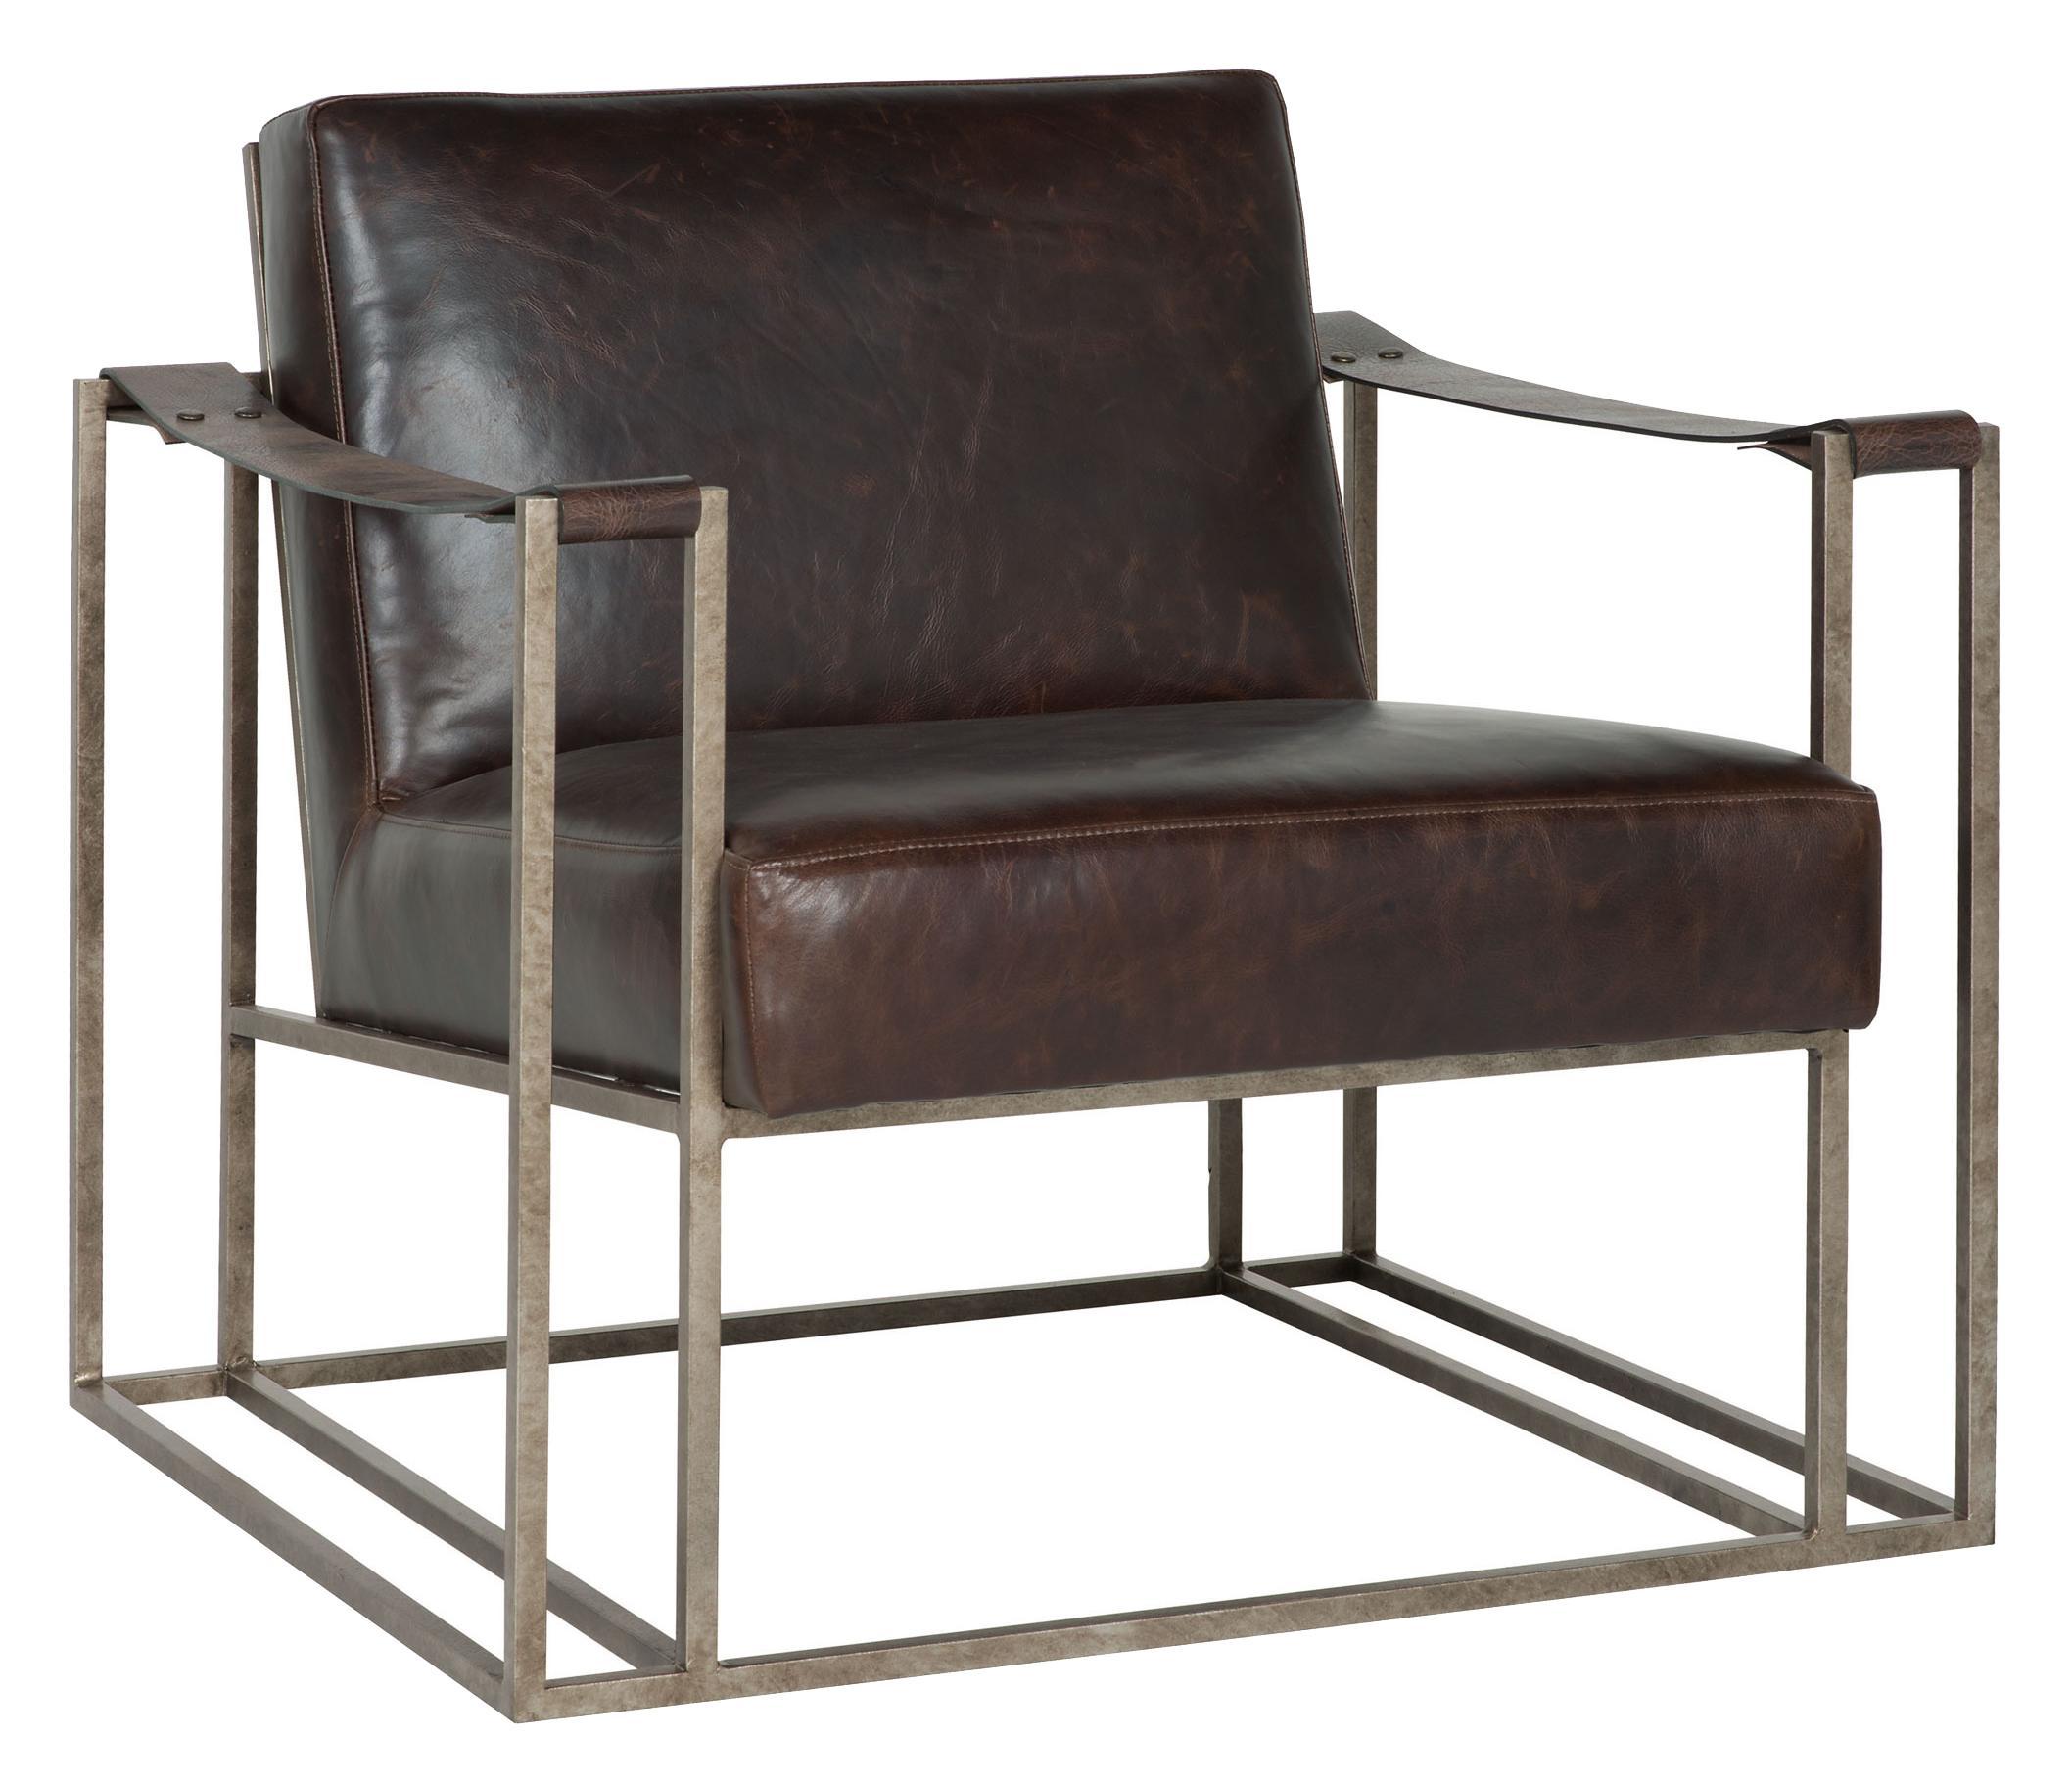 Exceptionnel Bernhardt DekkerDekker Leather Chair